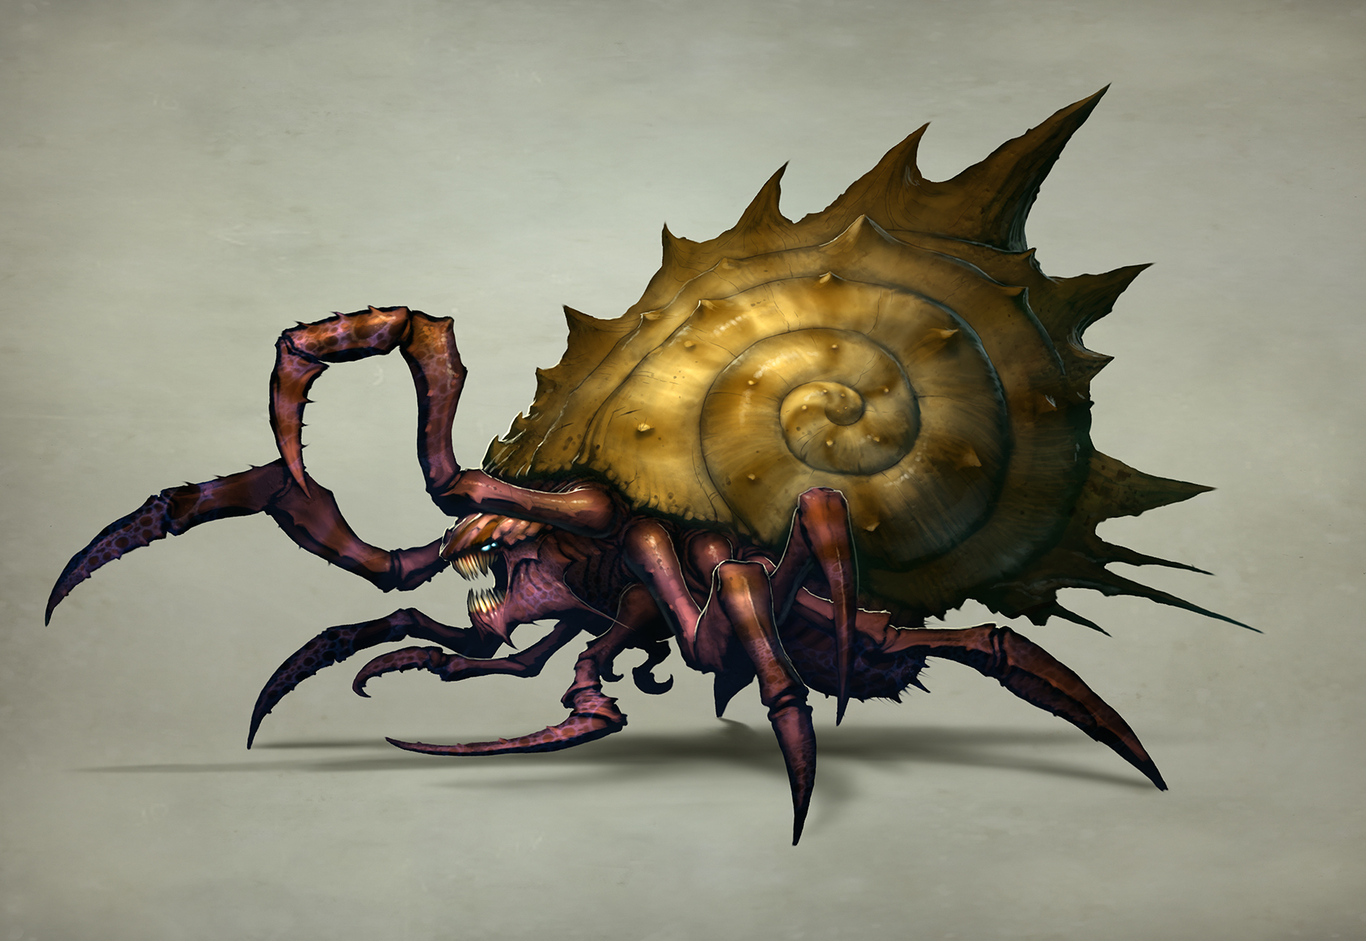 Fowlerillus armored whelk 1 5a86cebe ap9u